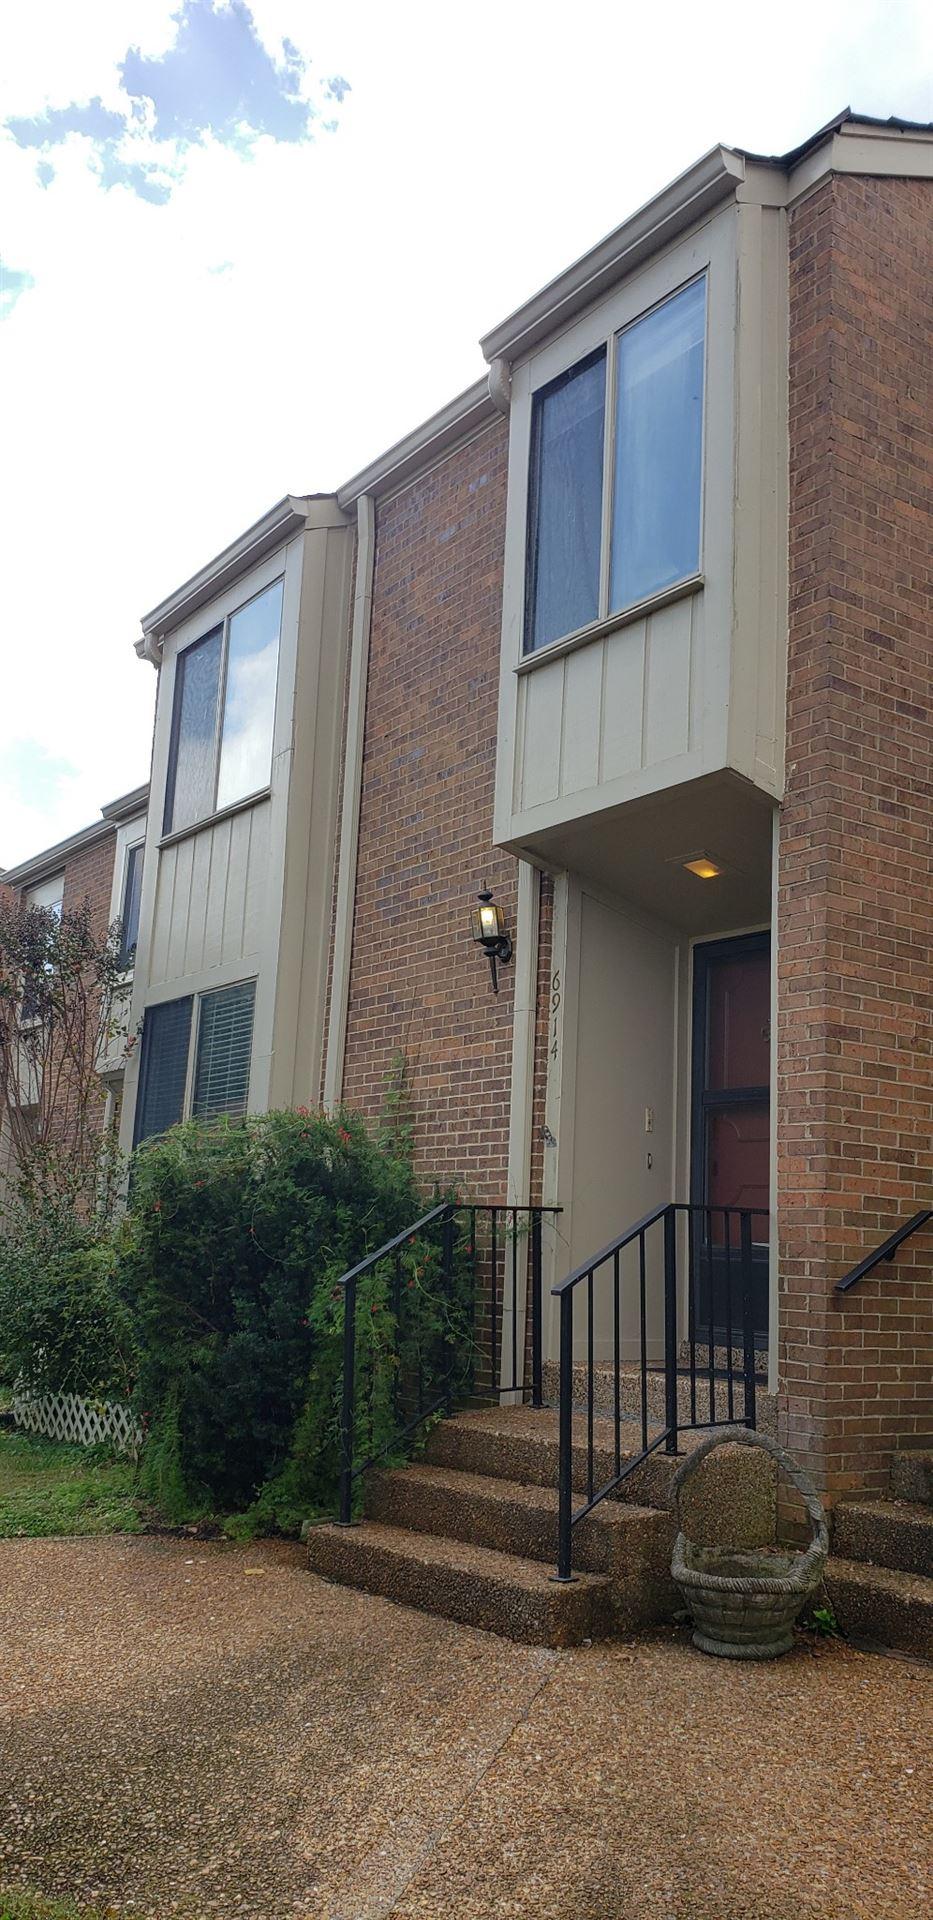 Photo of 6914 Highland Park Drive, Nashville, TN 37205 (MLS # 2300569)